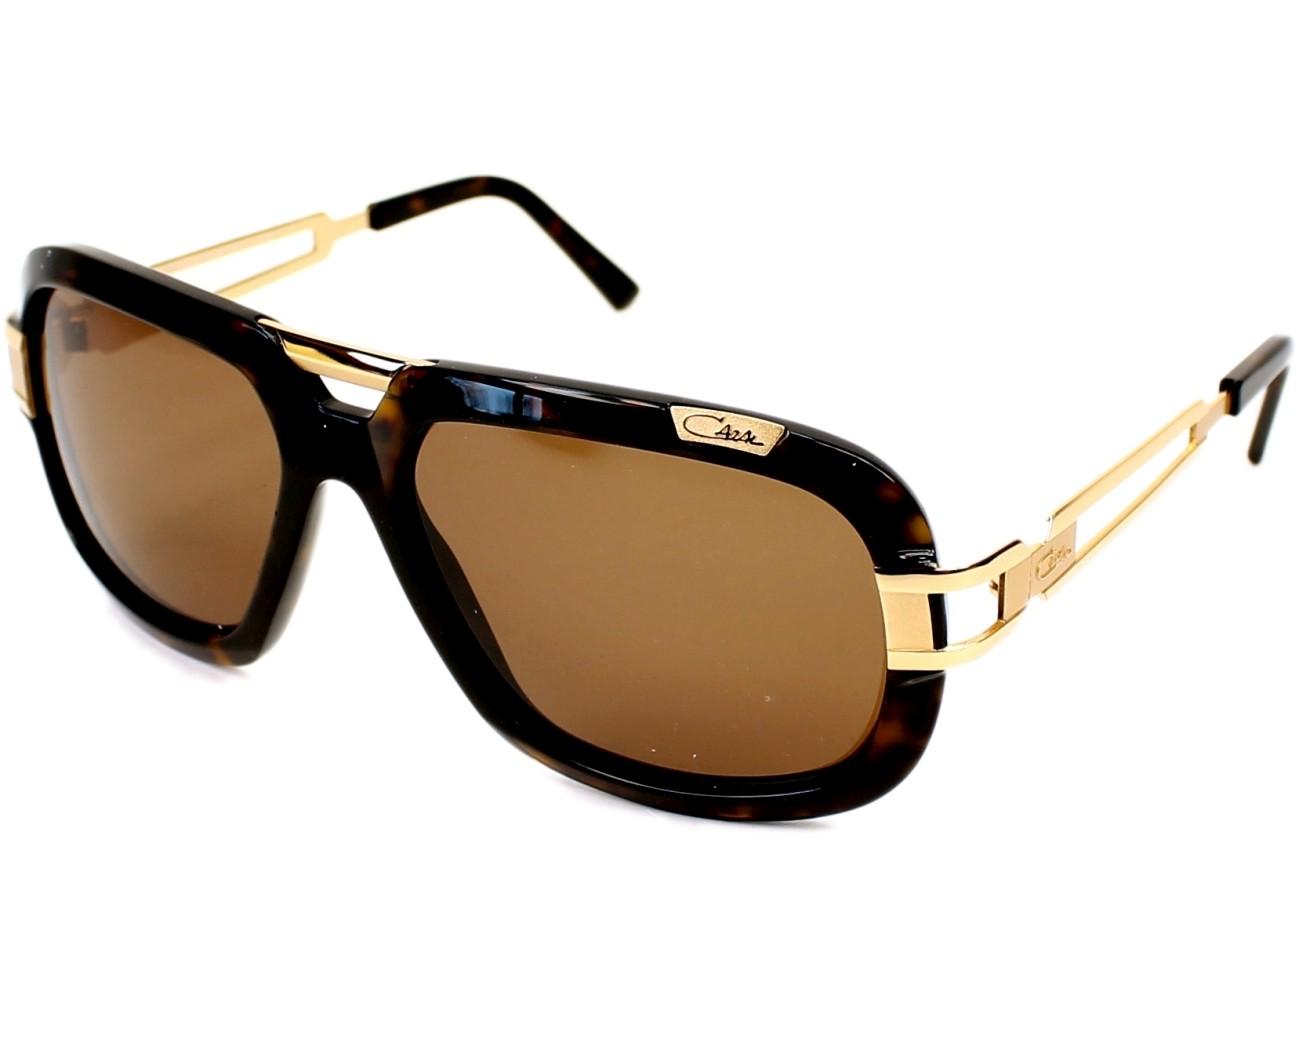 Sunglasses Cazal 8015 003 59-17 Havana Gold profile view